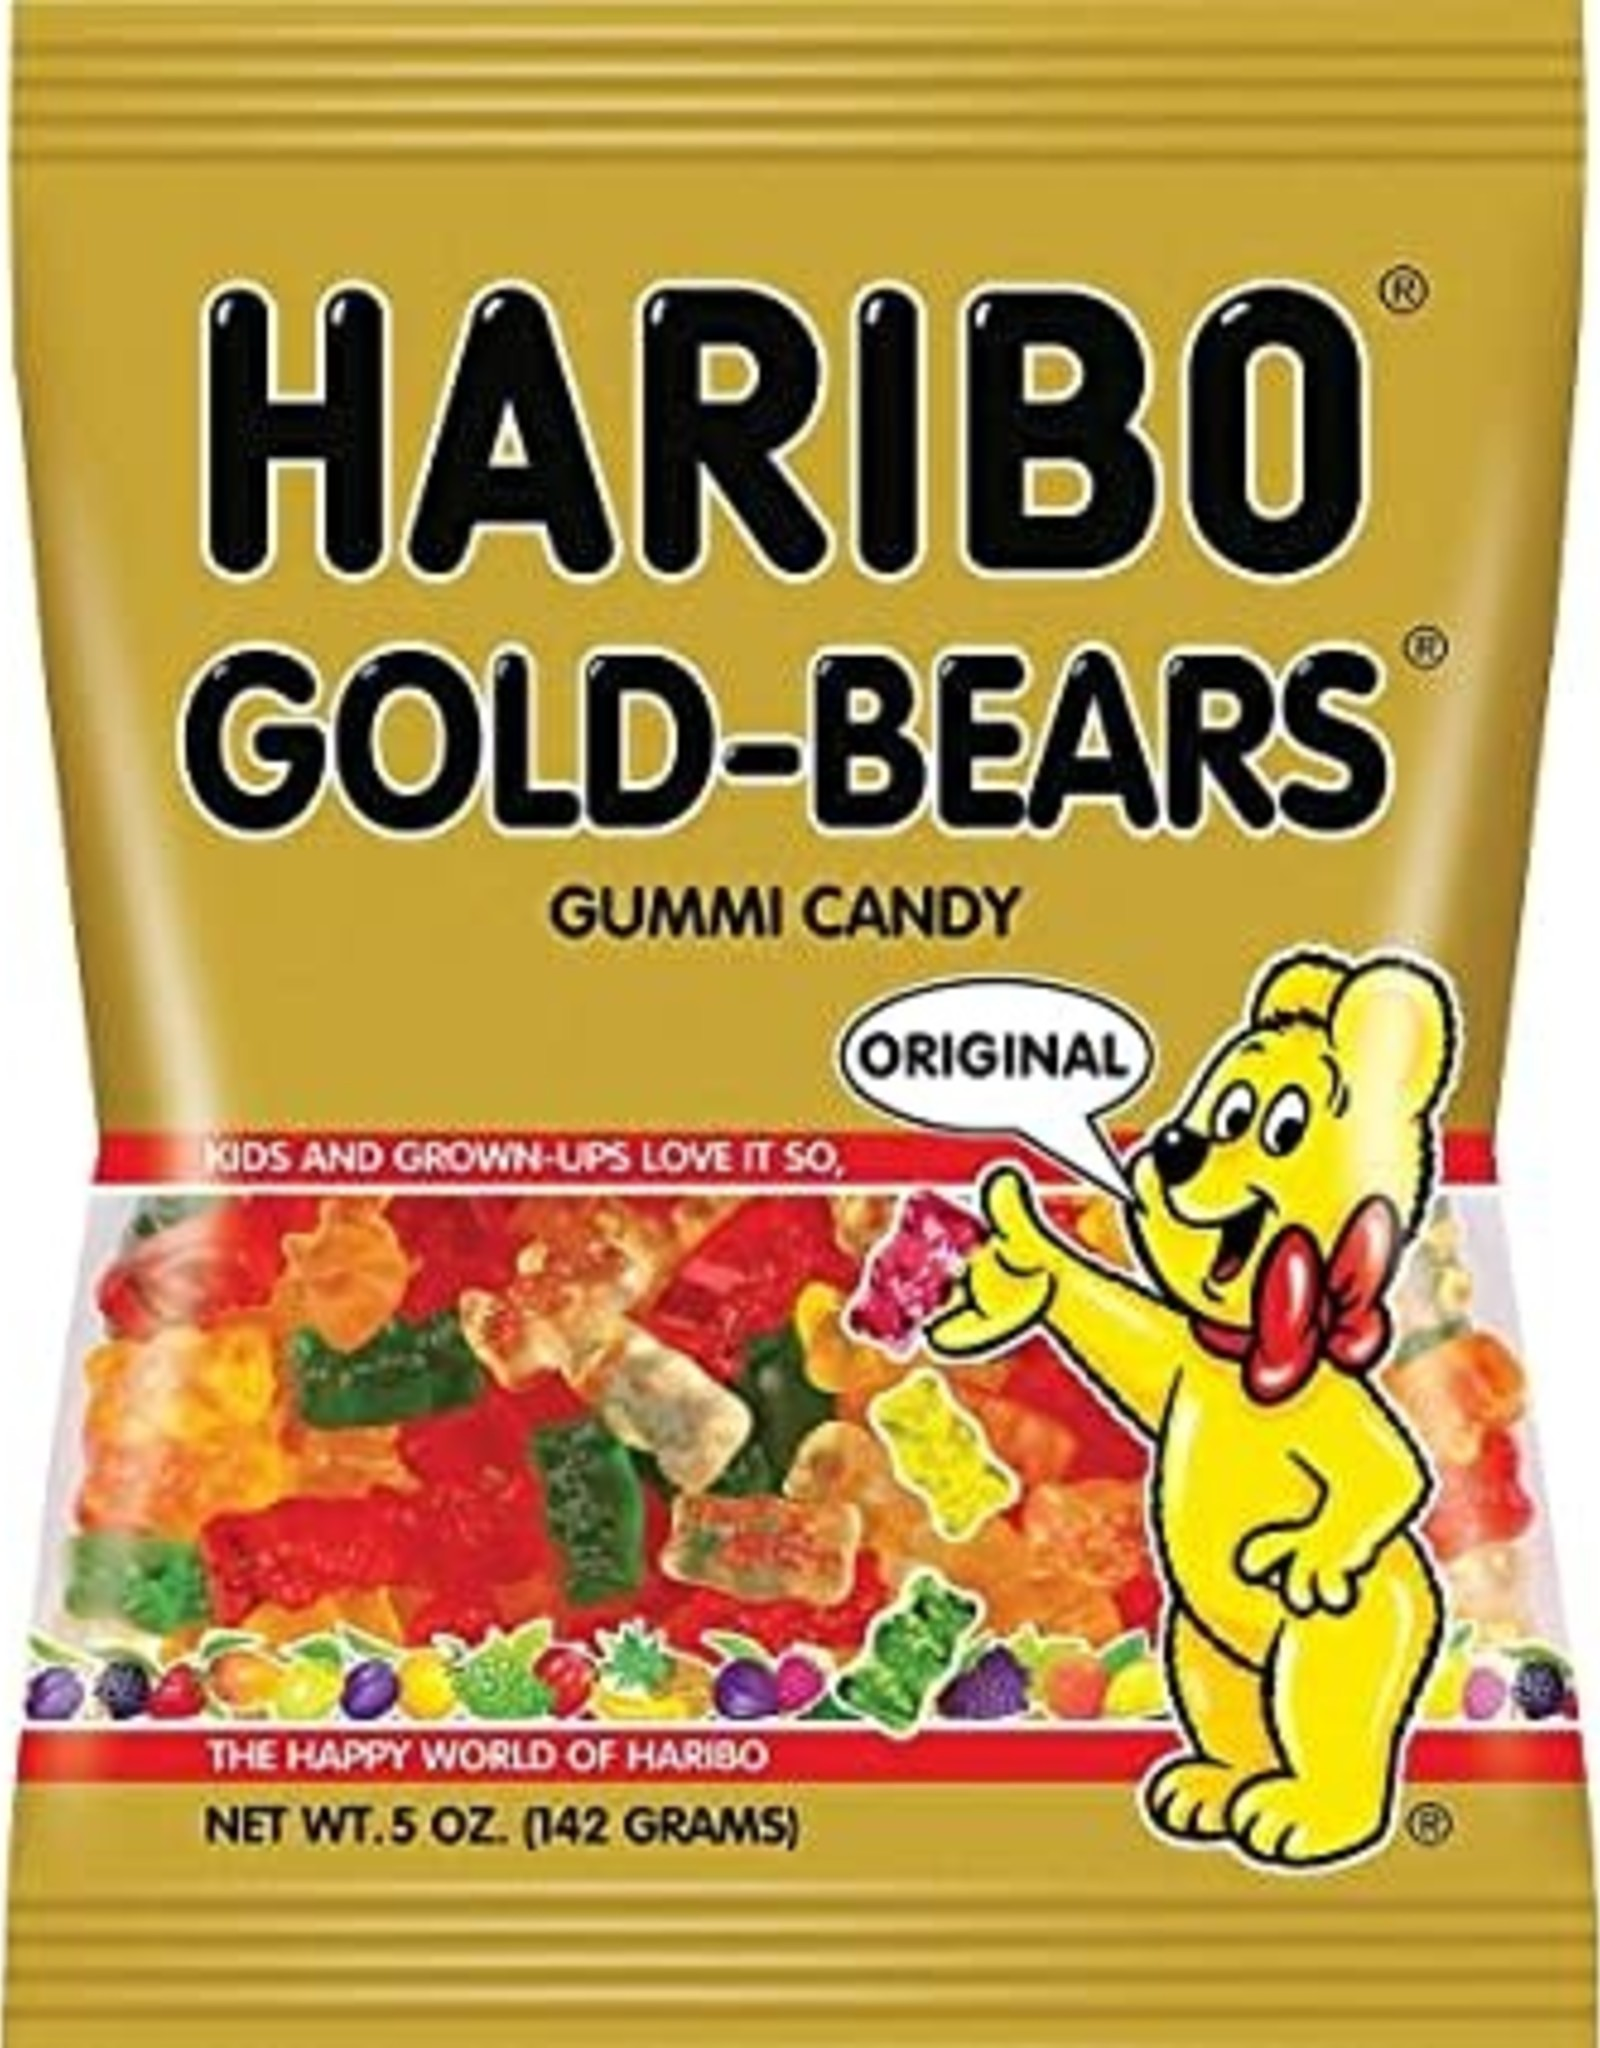 Haribo Haribo Gummi Gold-Bears (5 oz.)